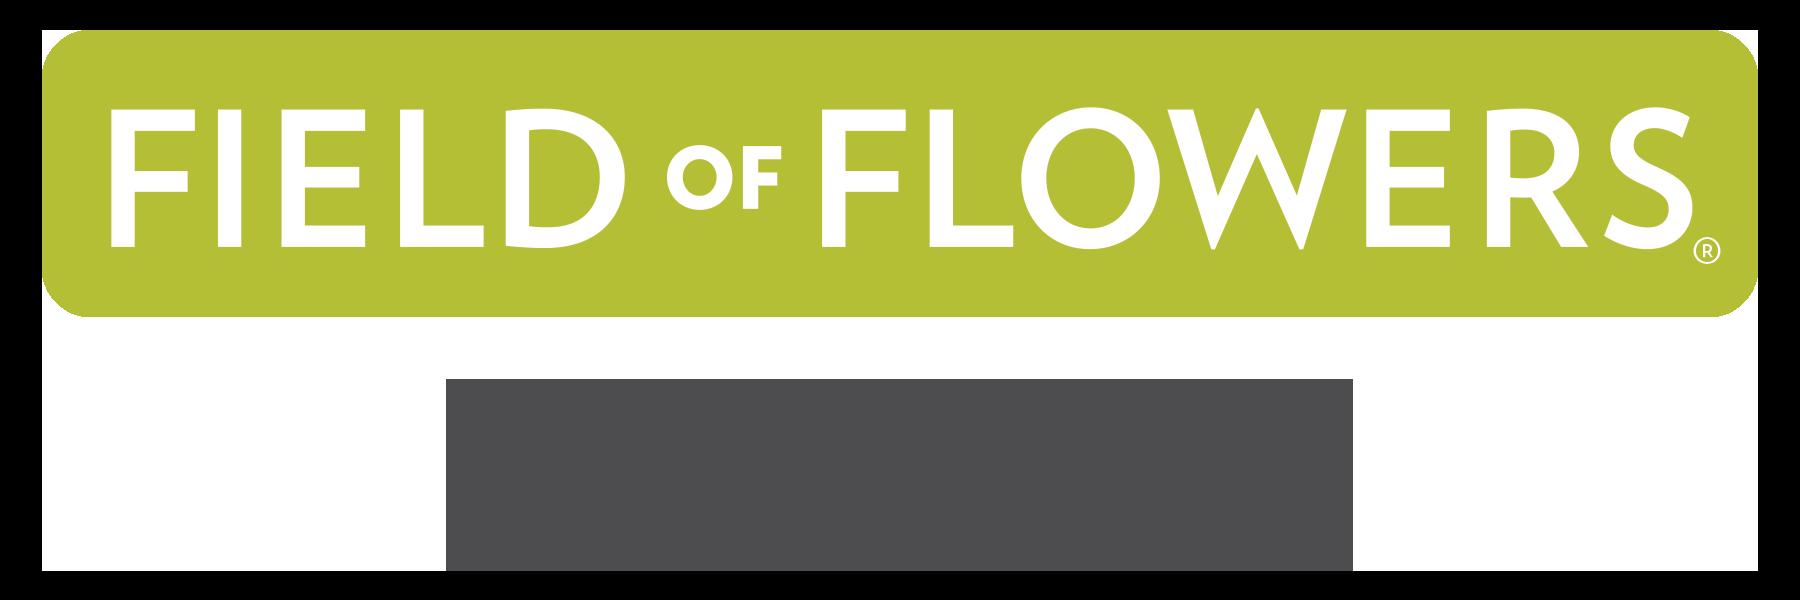 fof-web-policiespage.png